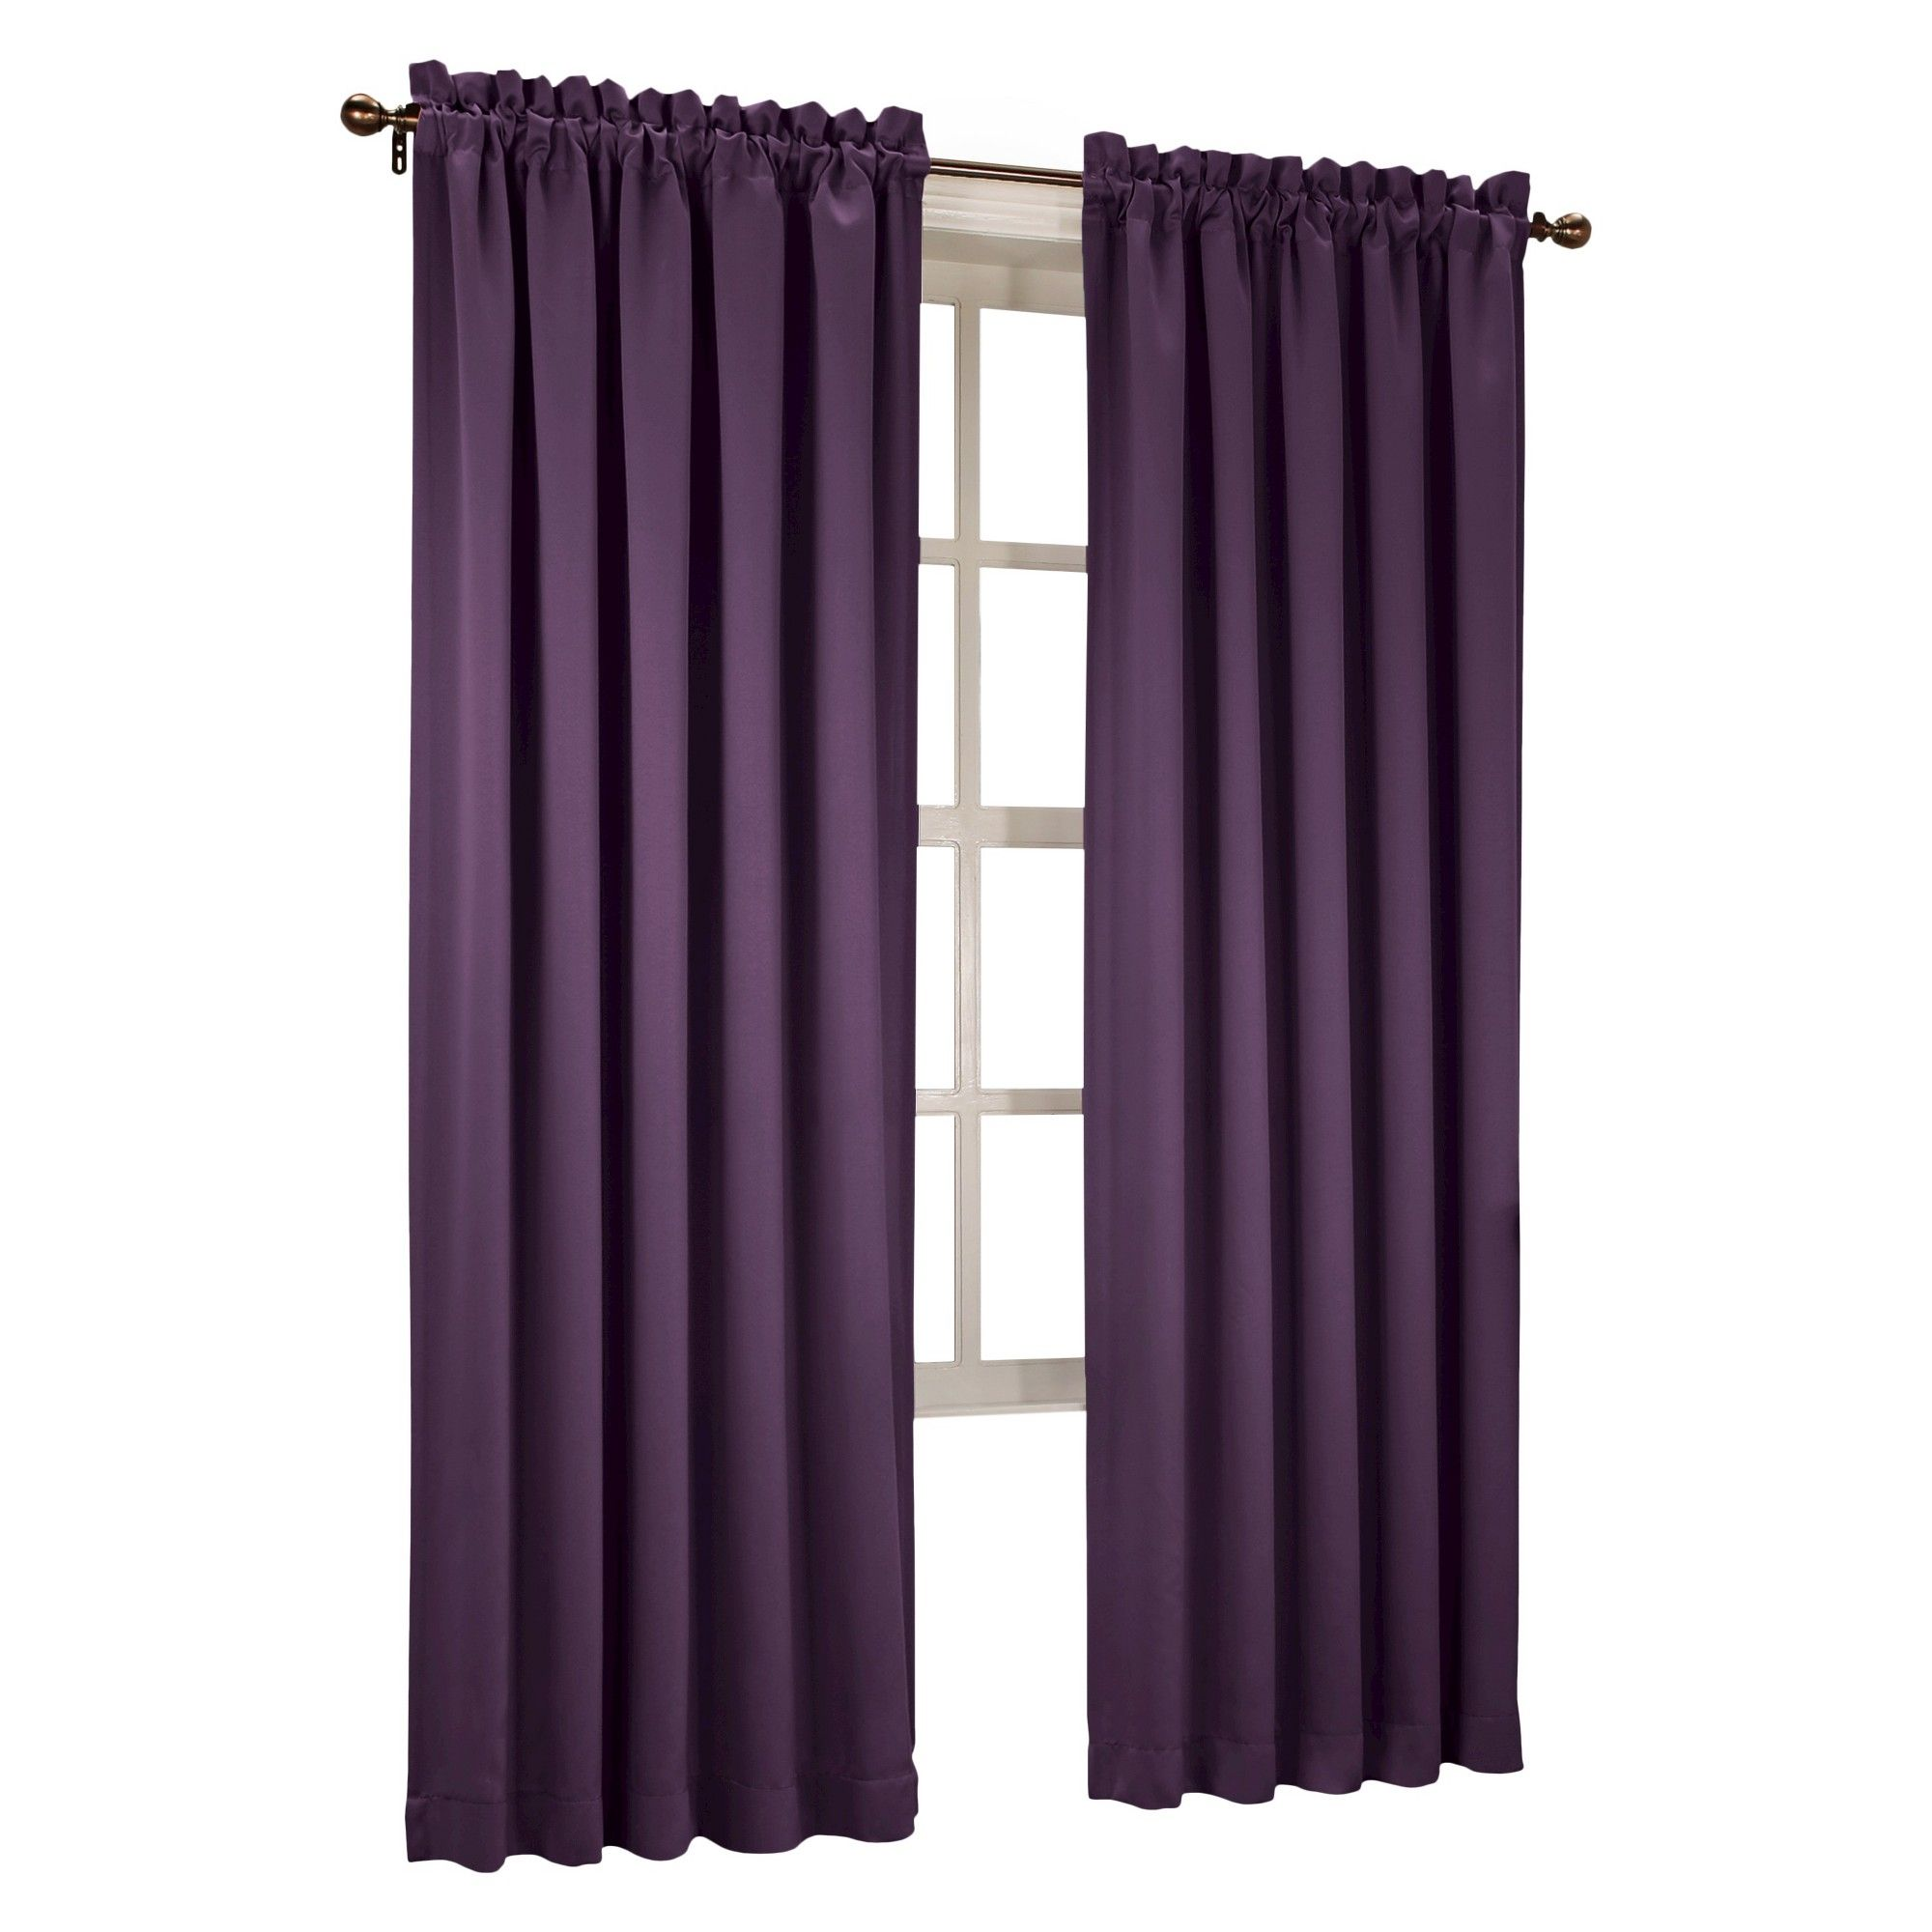 drapes purple furniture of window bathroom best curtains curtain ideas design decor or